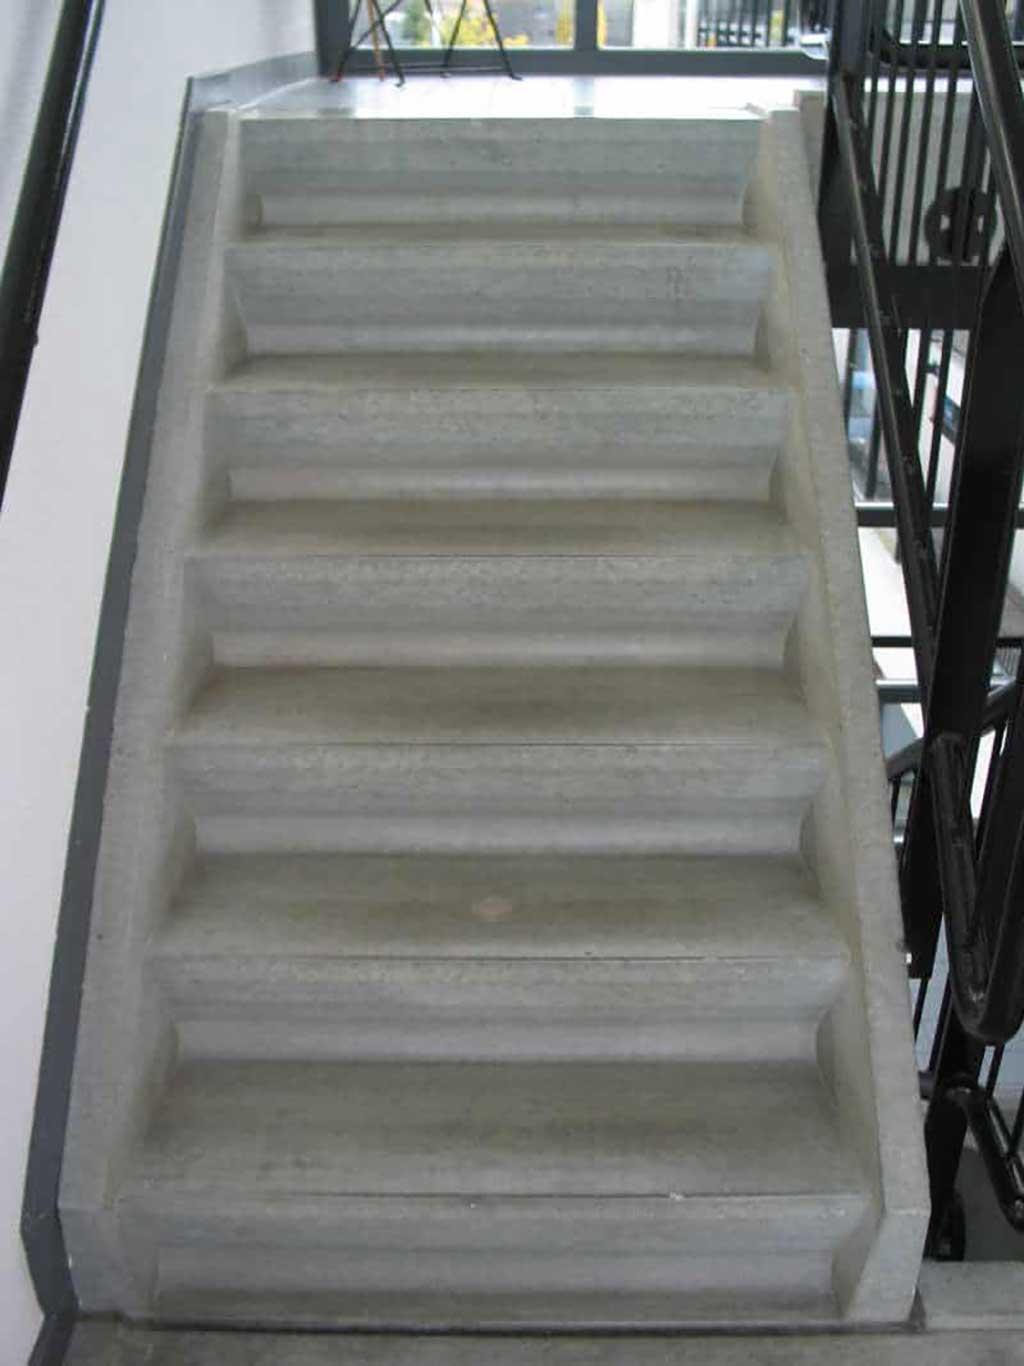 GripFactory MicroGrip Anti-Slip - concrete staircase